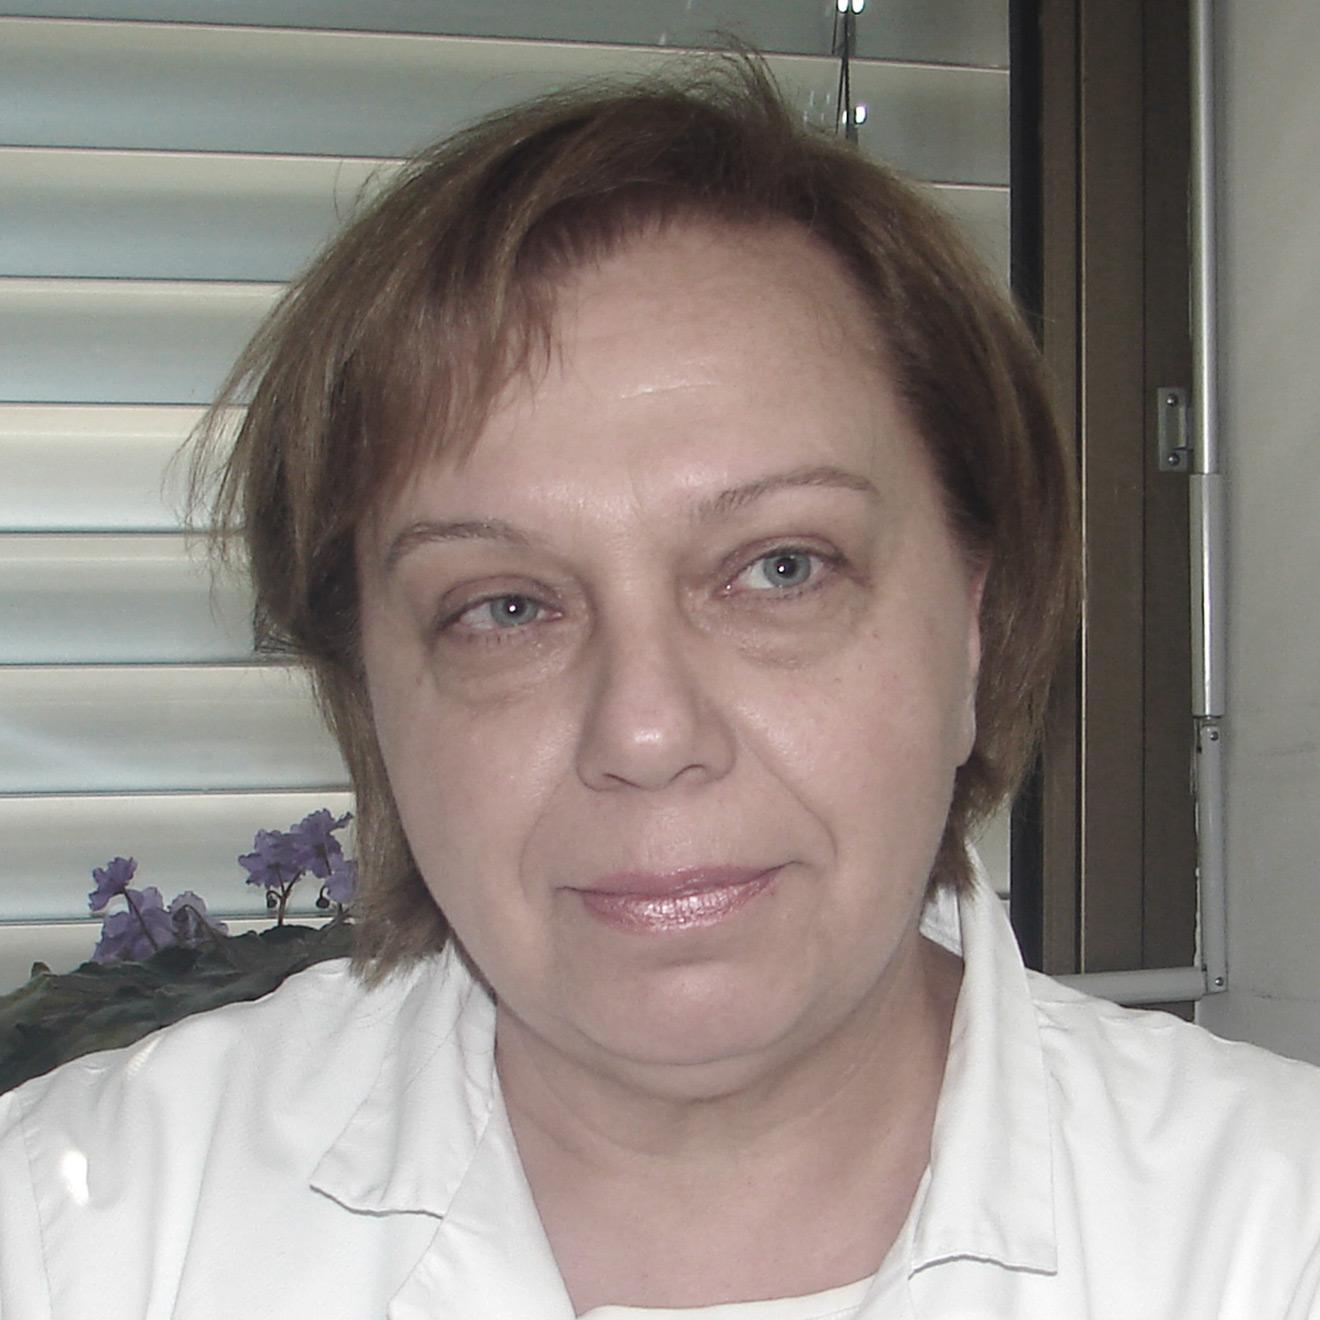 Lidija Biserkoska Atanasovska